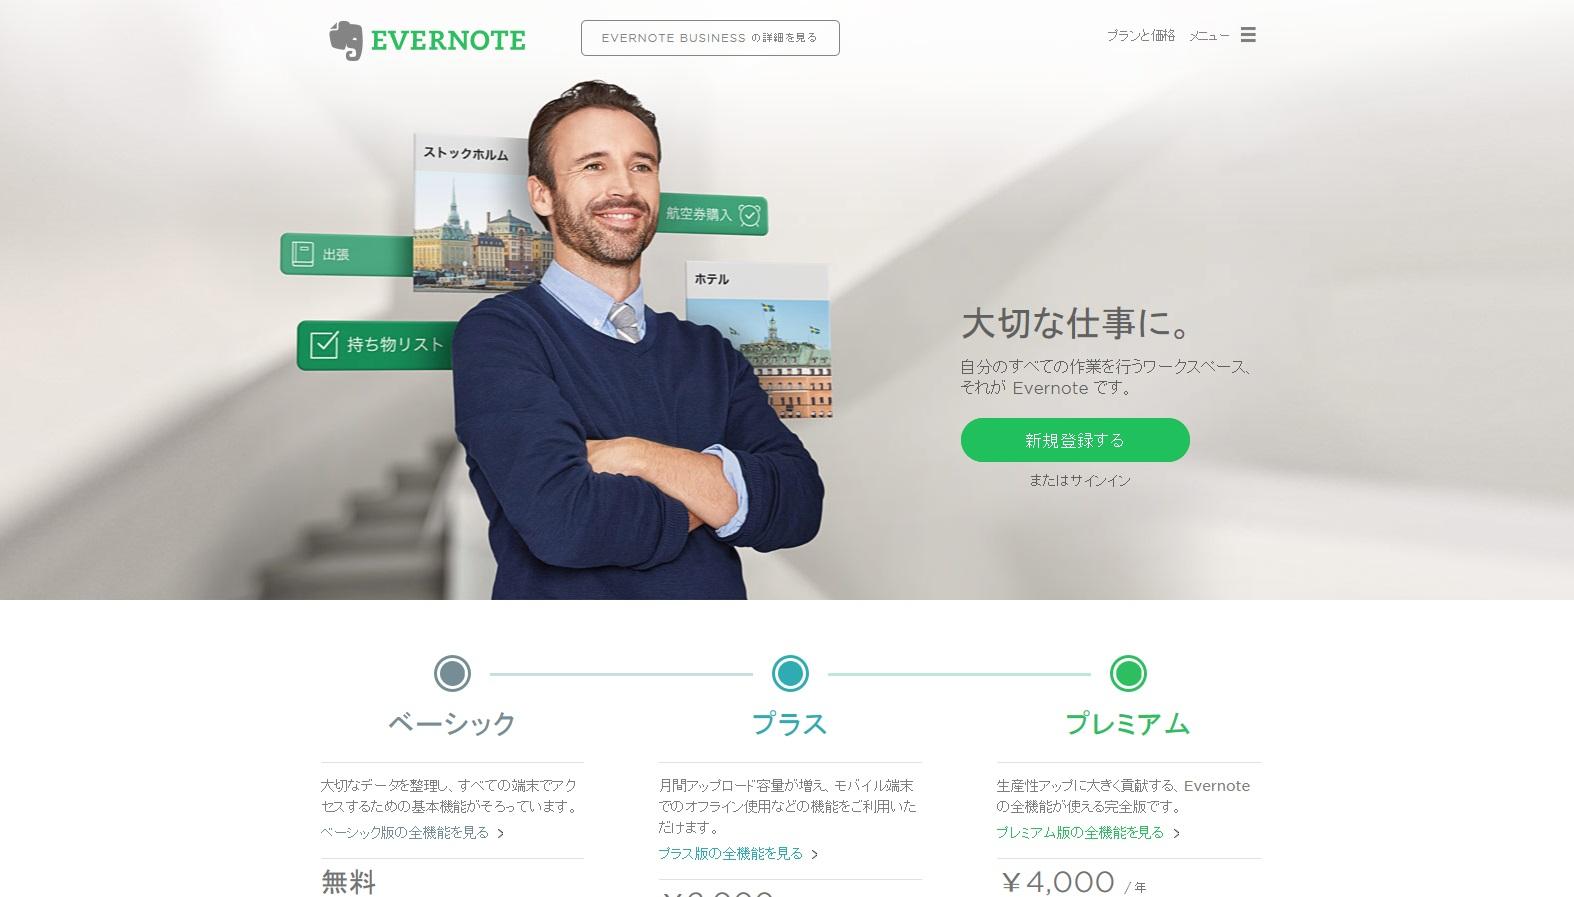 evernote-thumbnail